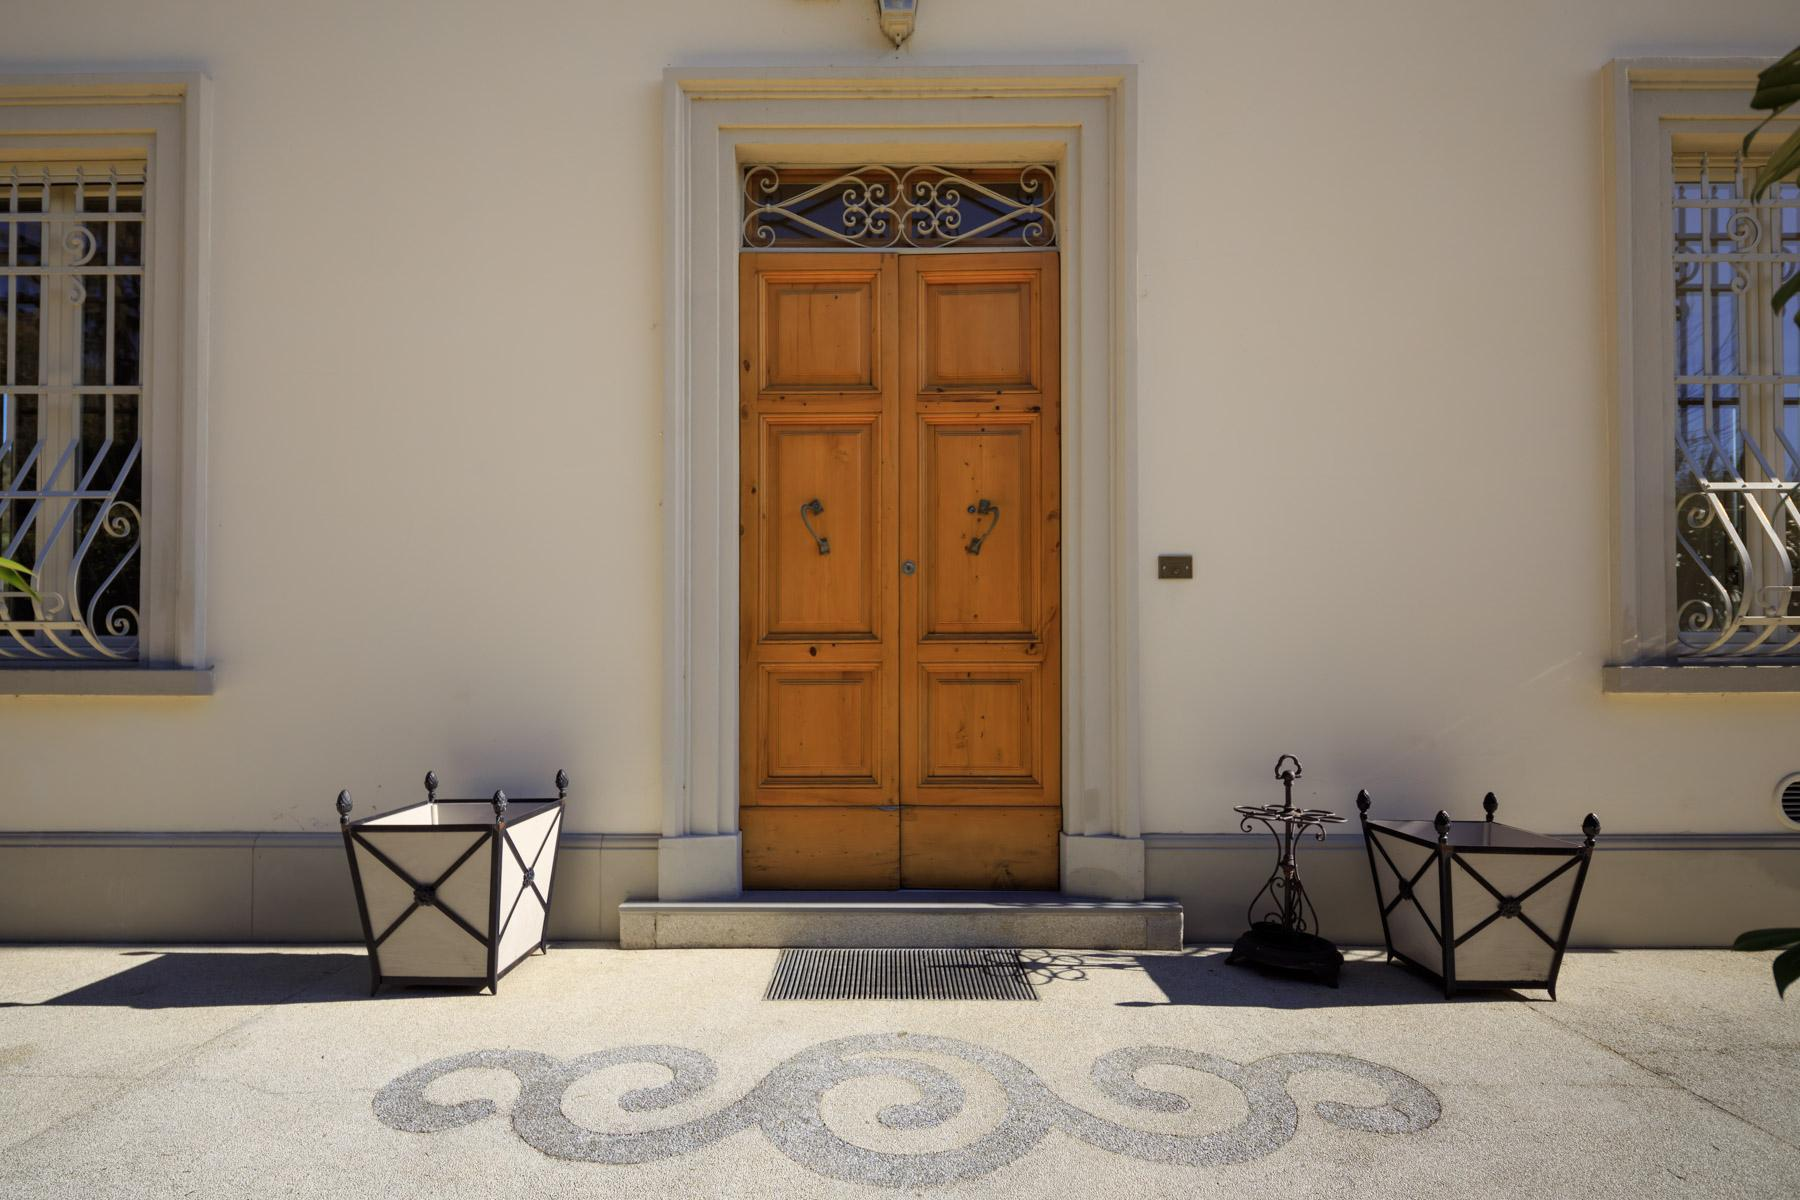 Montecatini Terme小镇优雅的新艺术风格的别墅 - 28